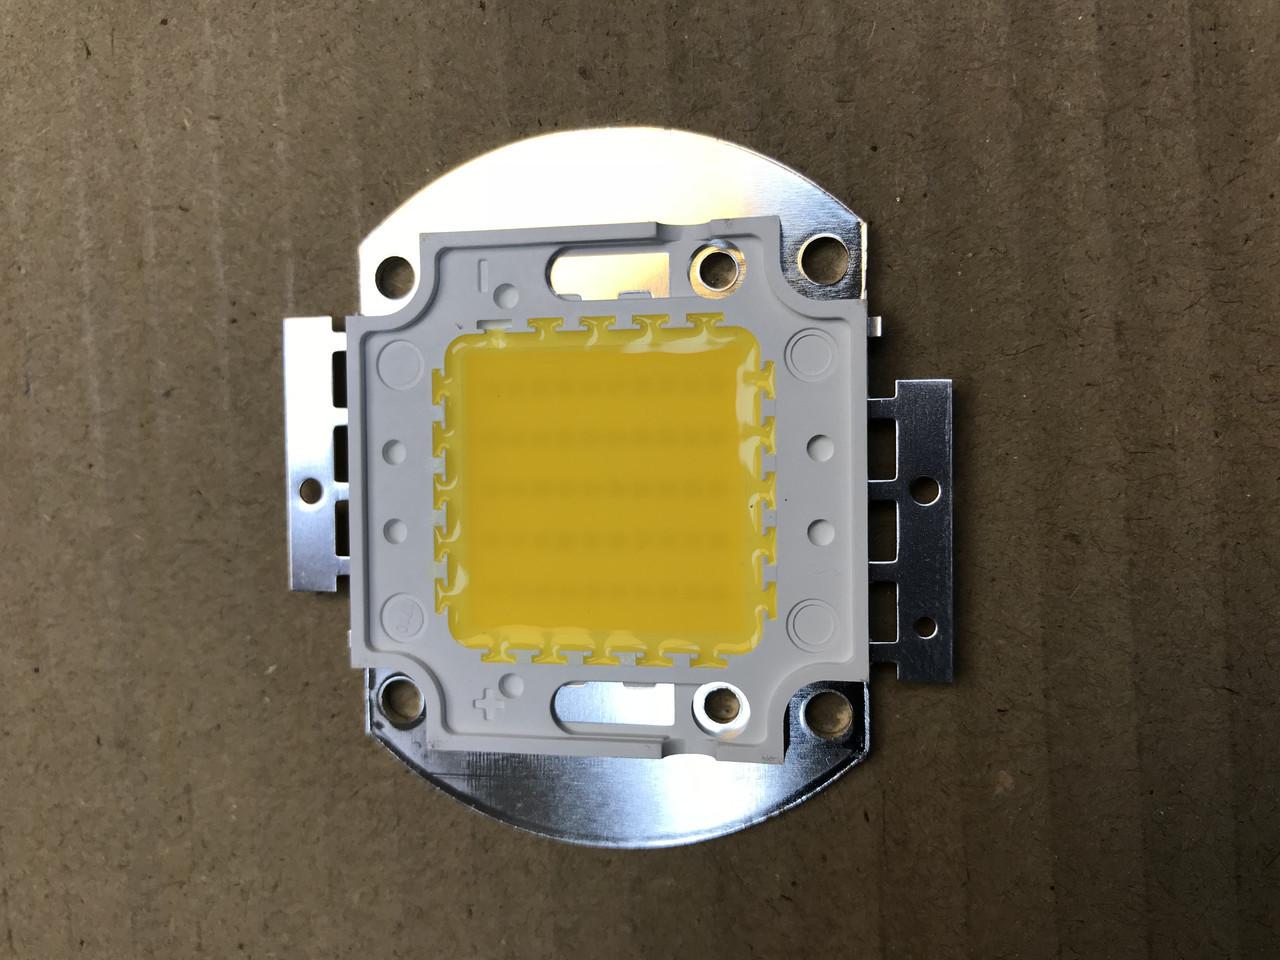 Светодиод матричный PREMIUM СОВ для прожектора SL-50 50W 3000К (45Х45 mil) Код.58816